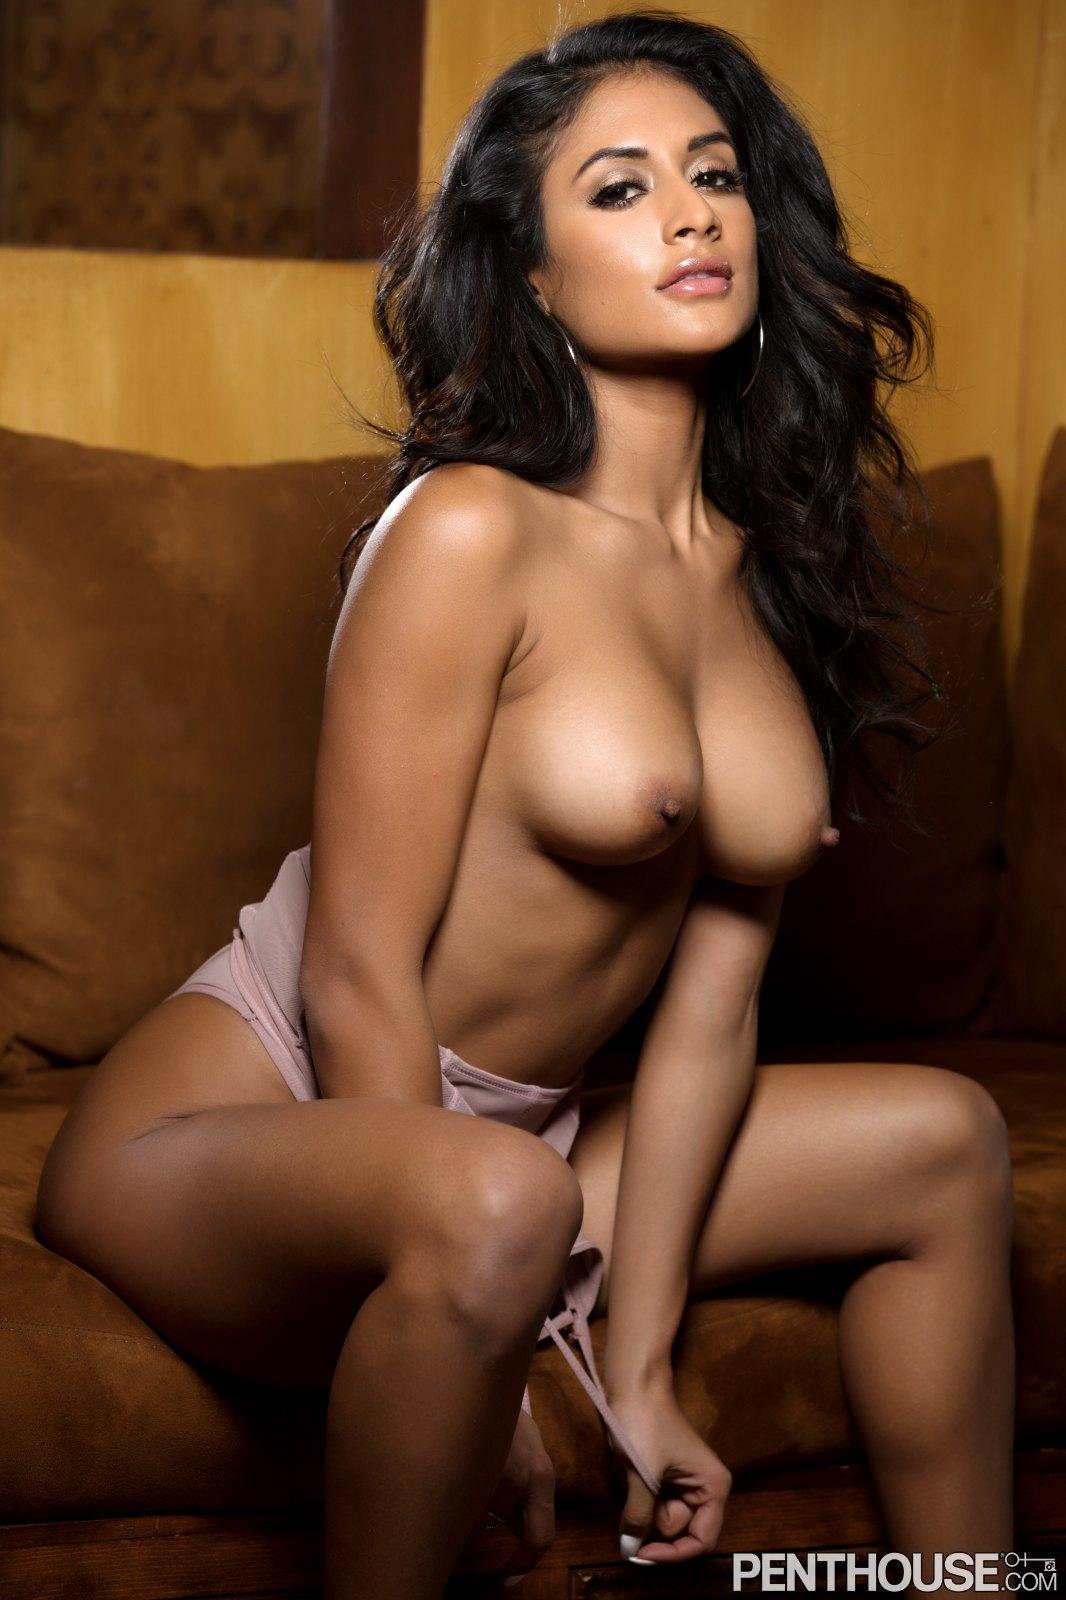 Nudes penthouse Penthouse Babes